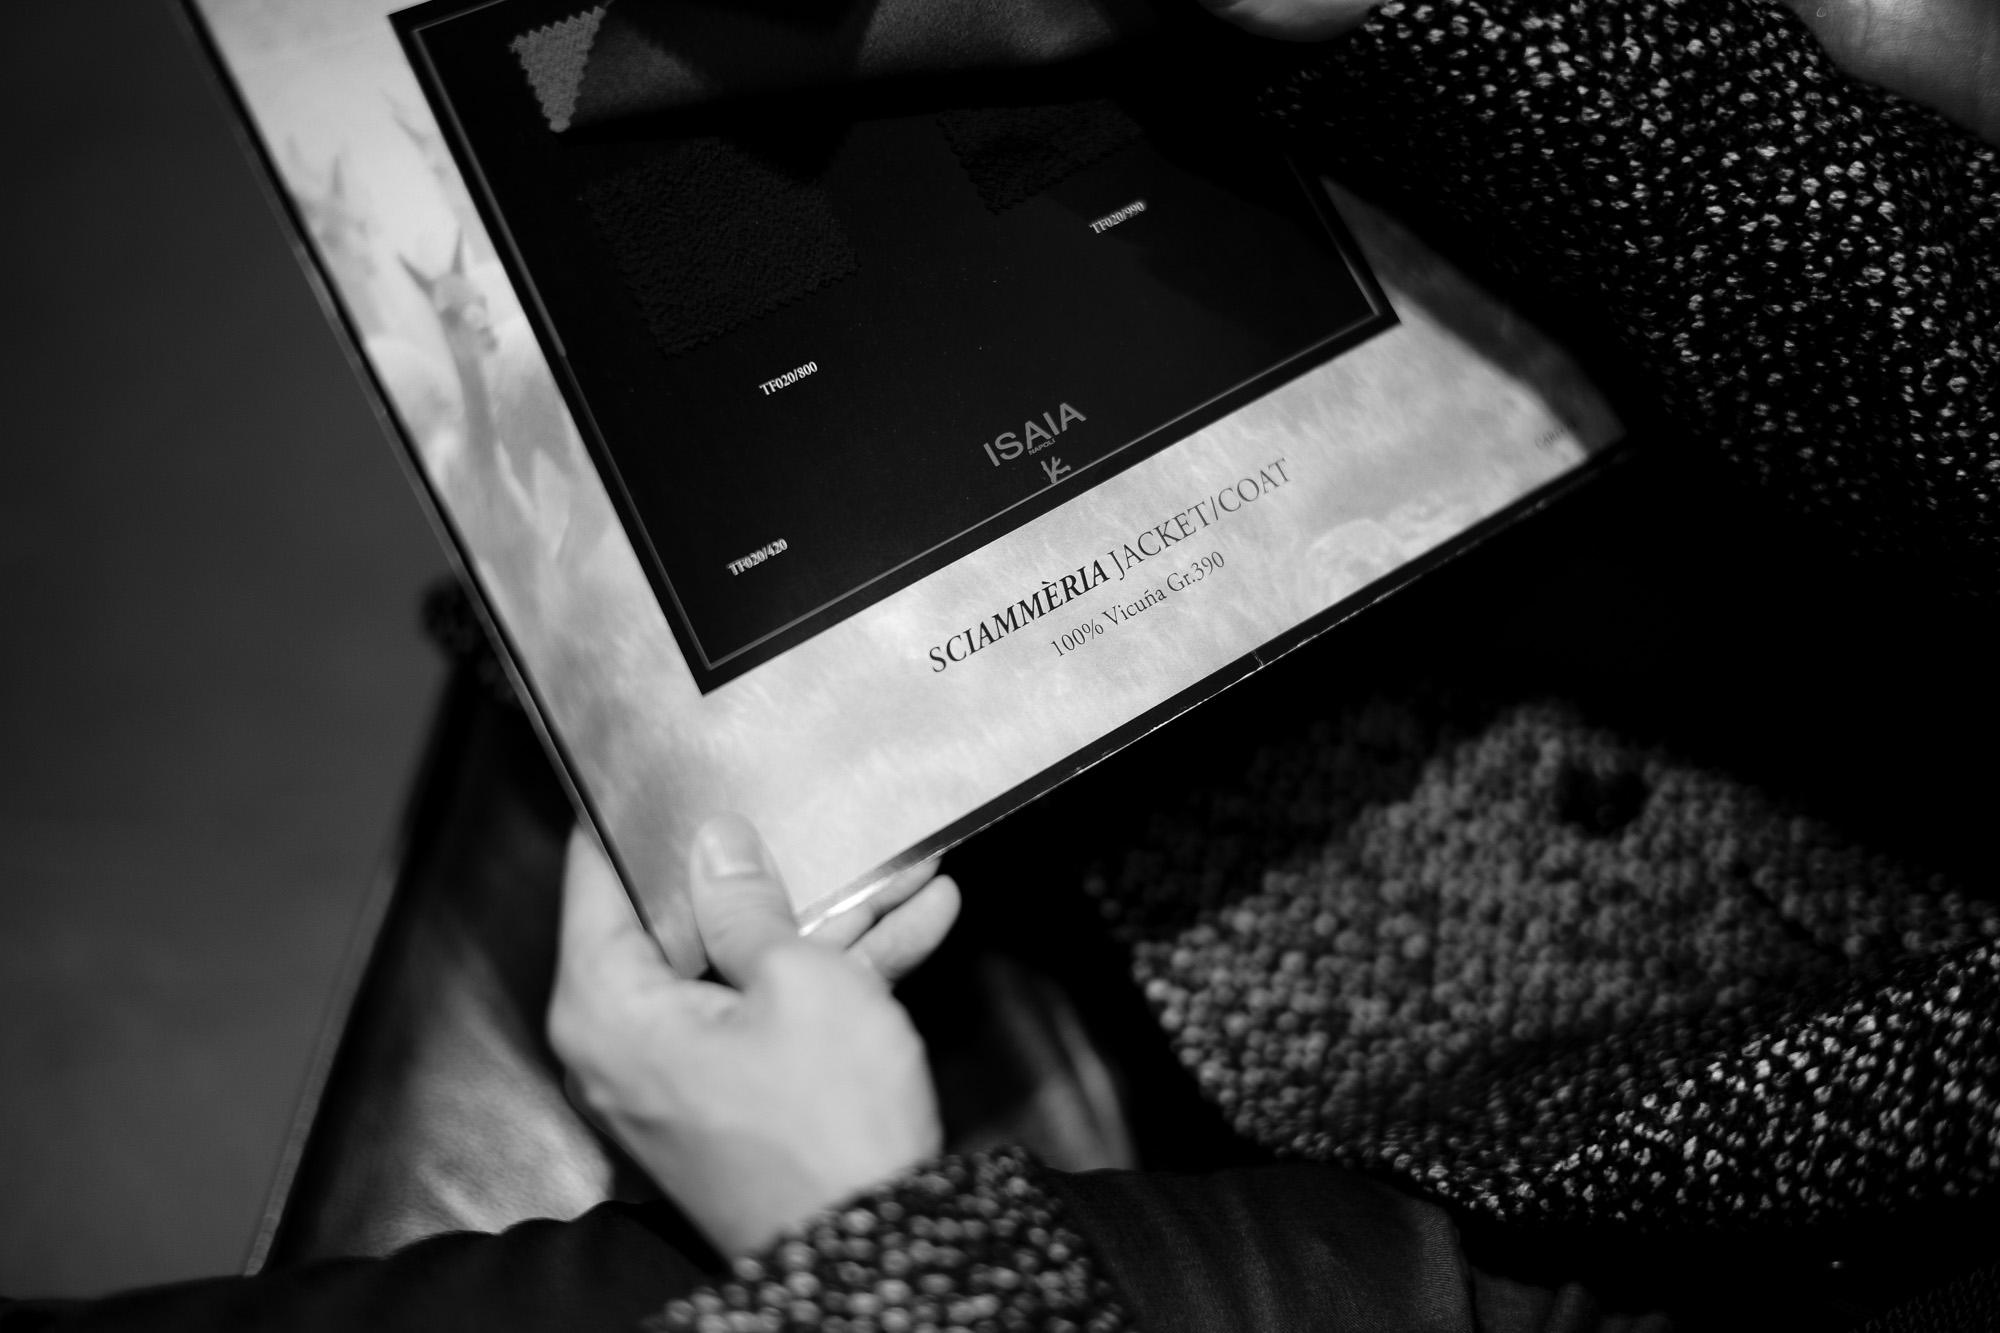 "ISAIA ""100% Vicuna"" Single Chester Coat , Double Chester Coat 2021 AW 【Special Model】 イザイア 2021秋冬 ビキューナ 超絶生地 COAT コート シングルコート ダブルコート チェスターコート スペシャルモデル  愛知 名古屋 Alto e Diritto altoediritto アルトエデリット"